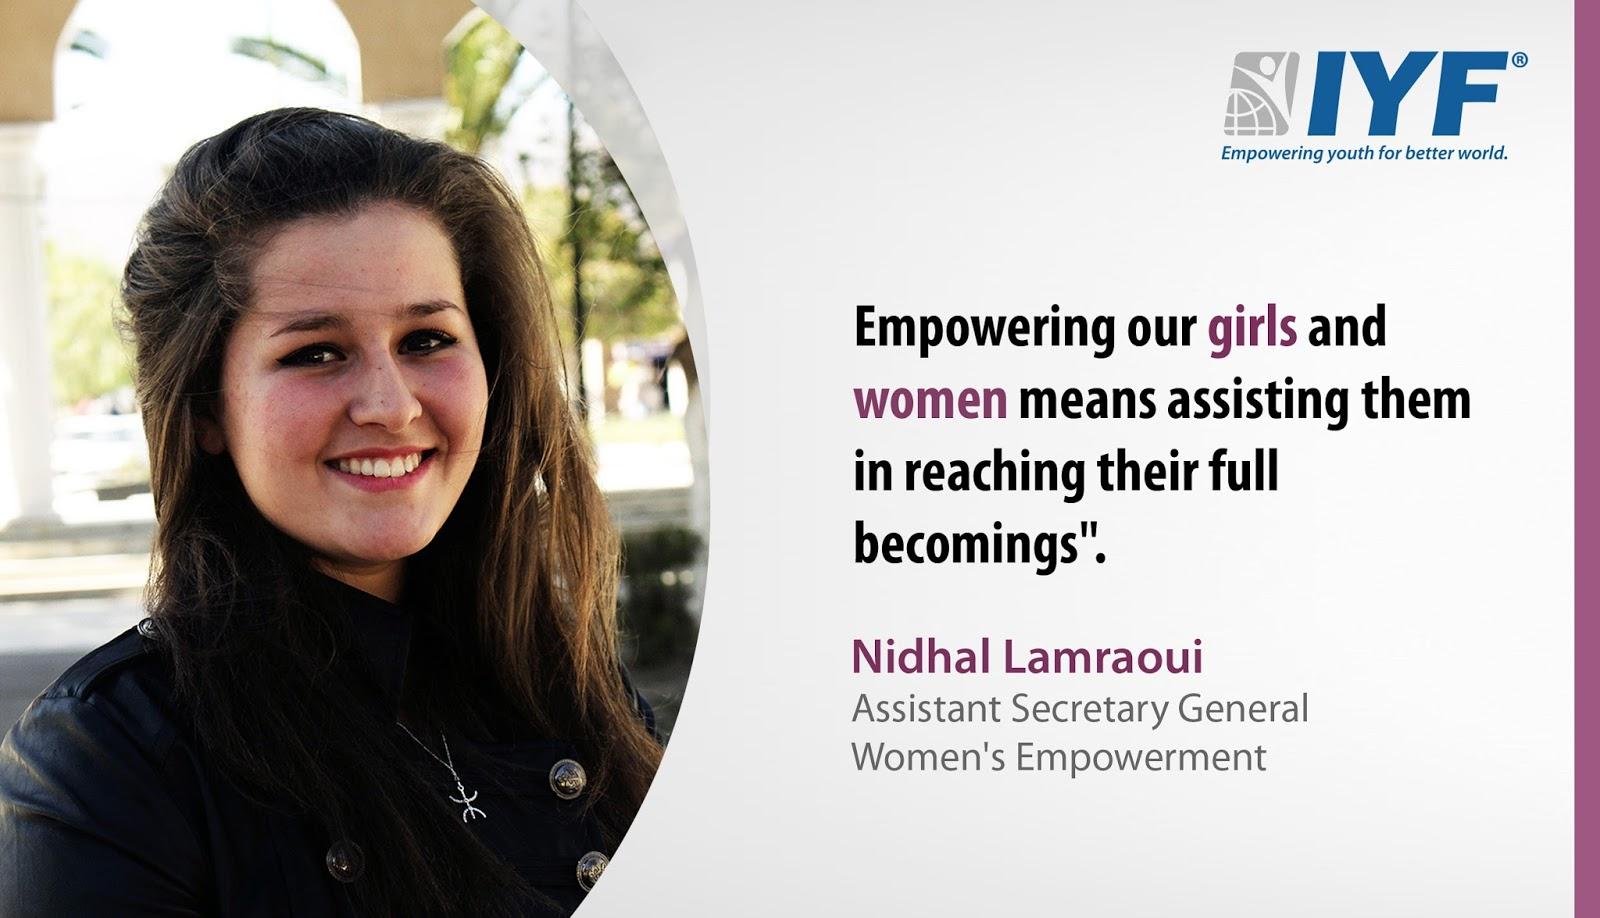 Nidhal Lamraoui, IYF Assistant Secretary General, Women's Empowerment